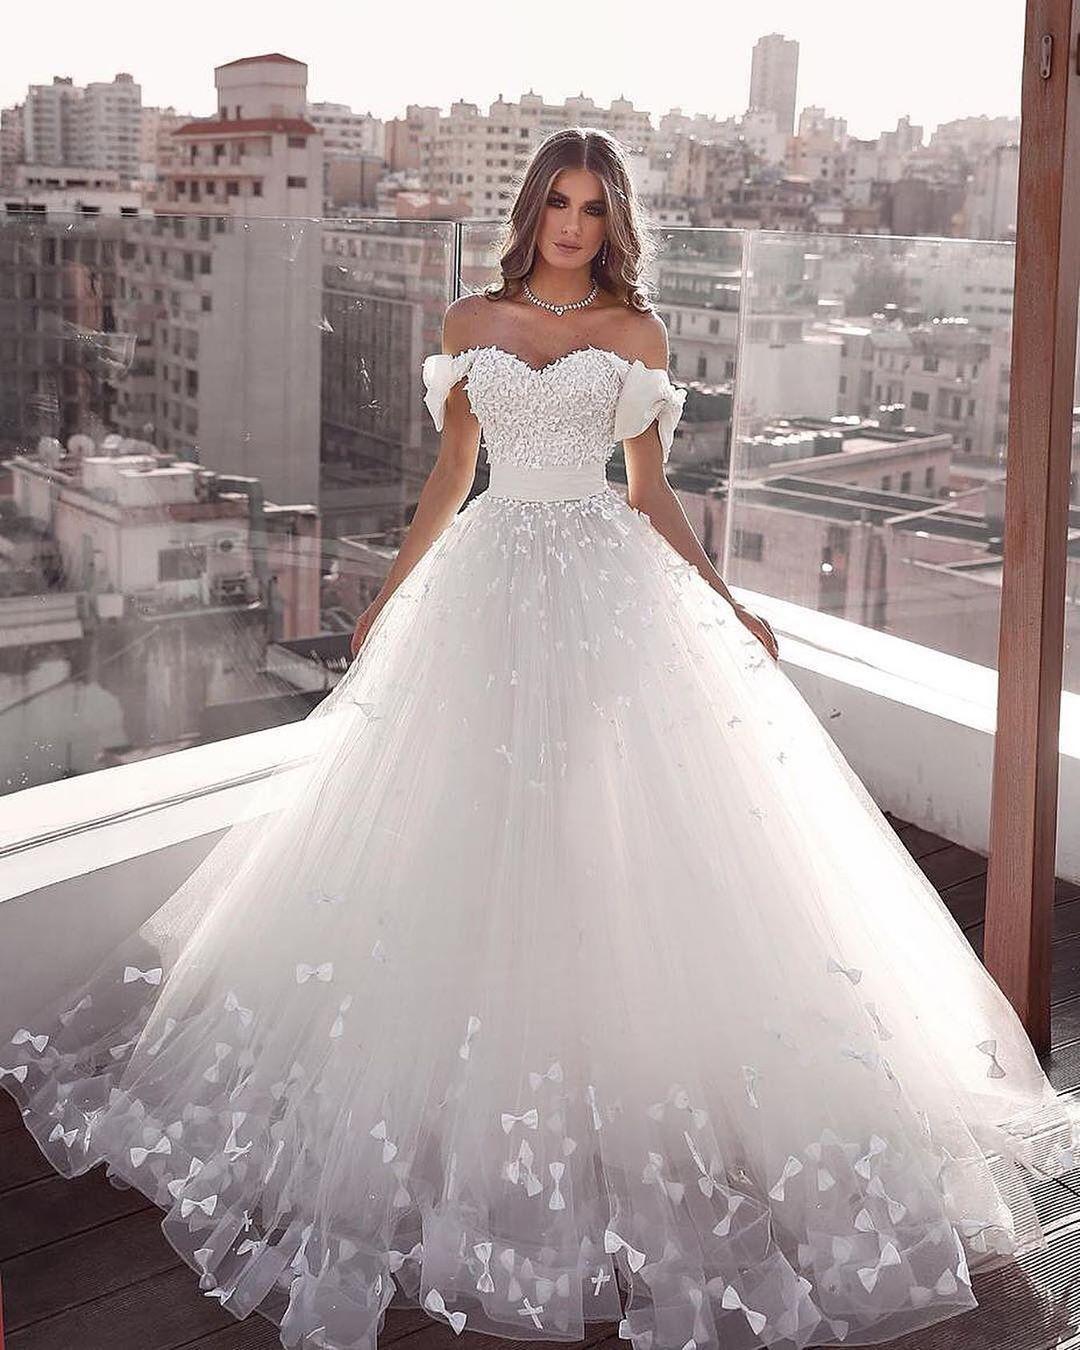 Trending Wedding Dresses Ball Gowns Wedding Bridal Ball Gown Princess Wedding Dresses [ 1350 x 1080 Pixel ]